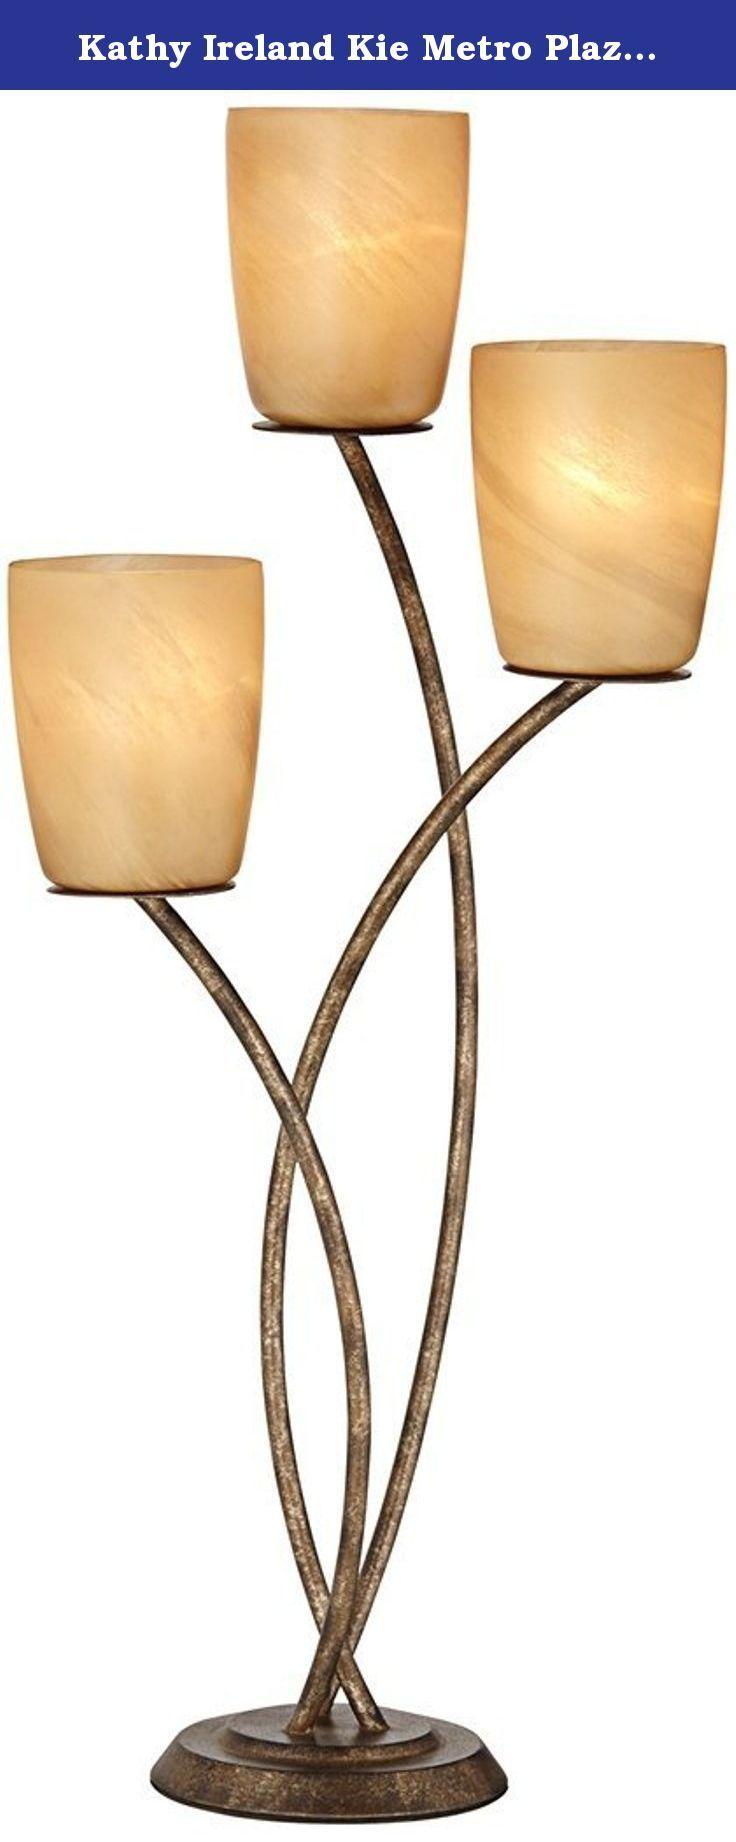 Kathy ireland kie metro plaza uplight table lamp